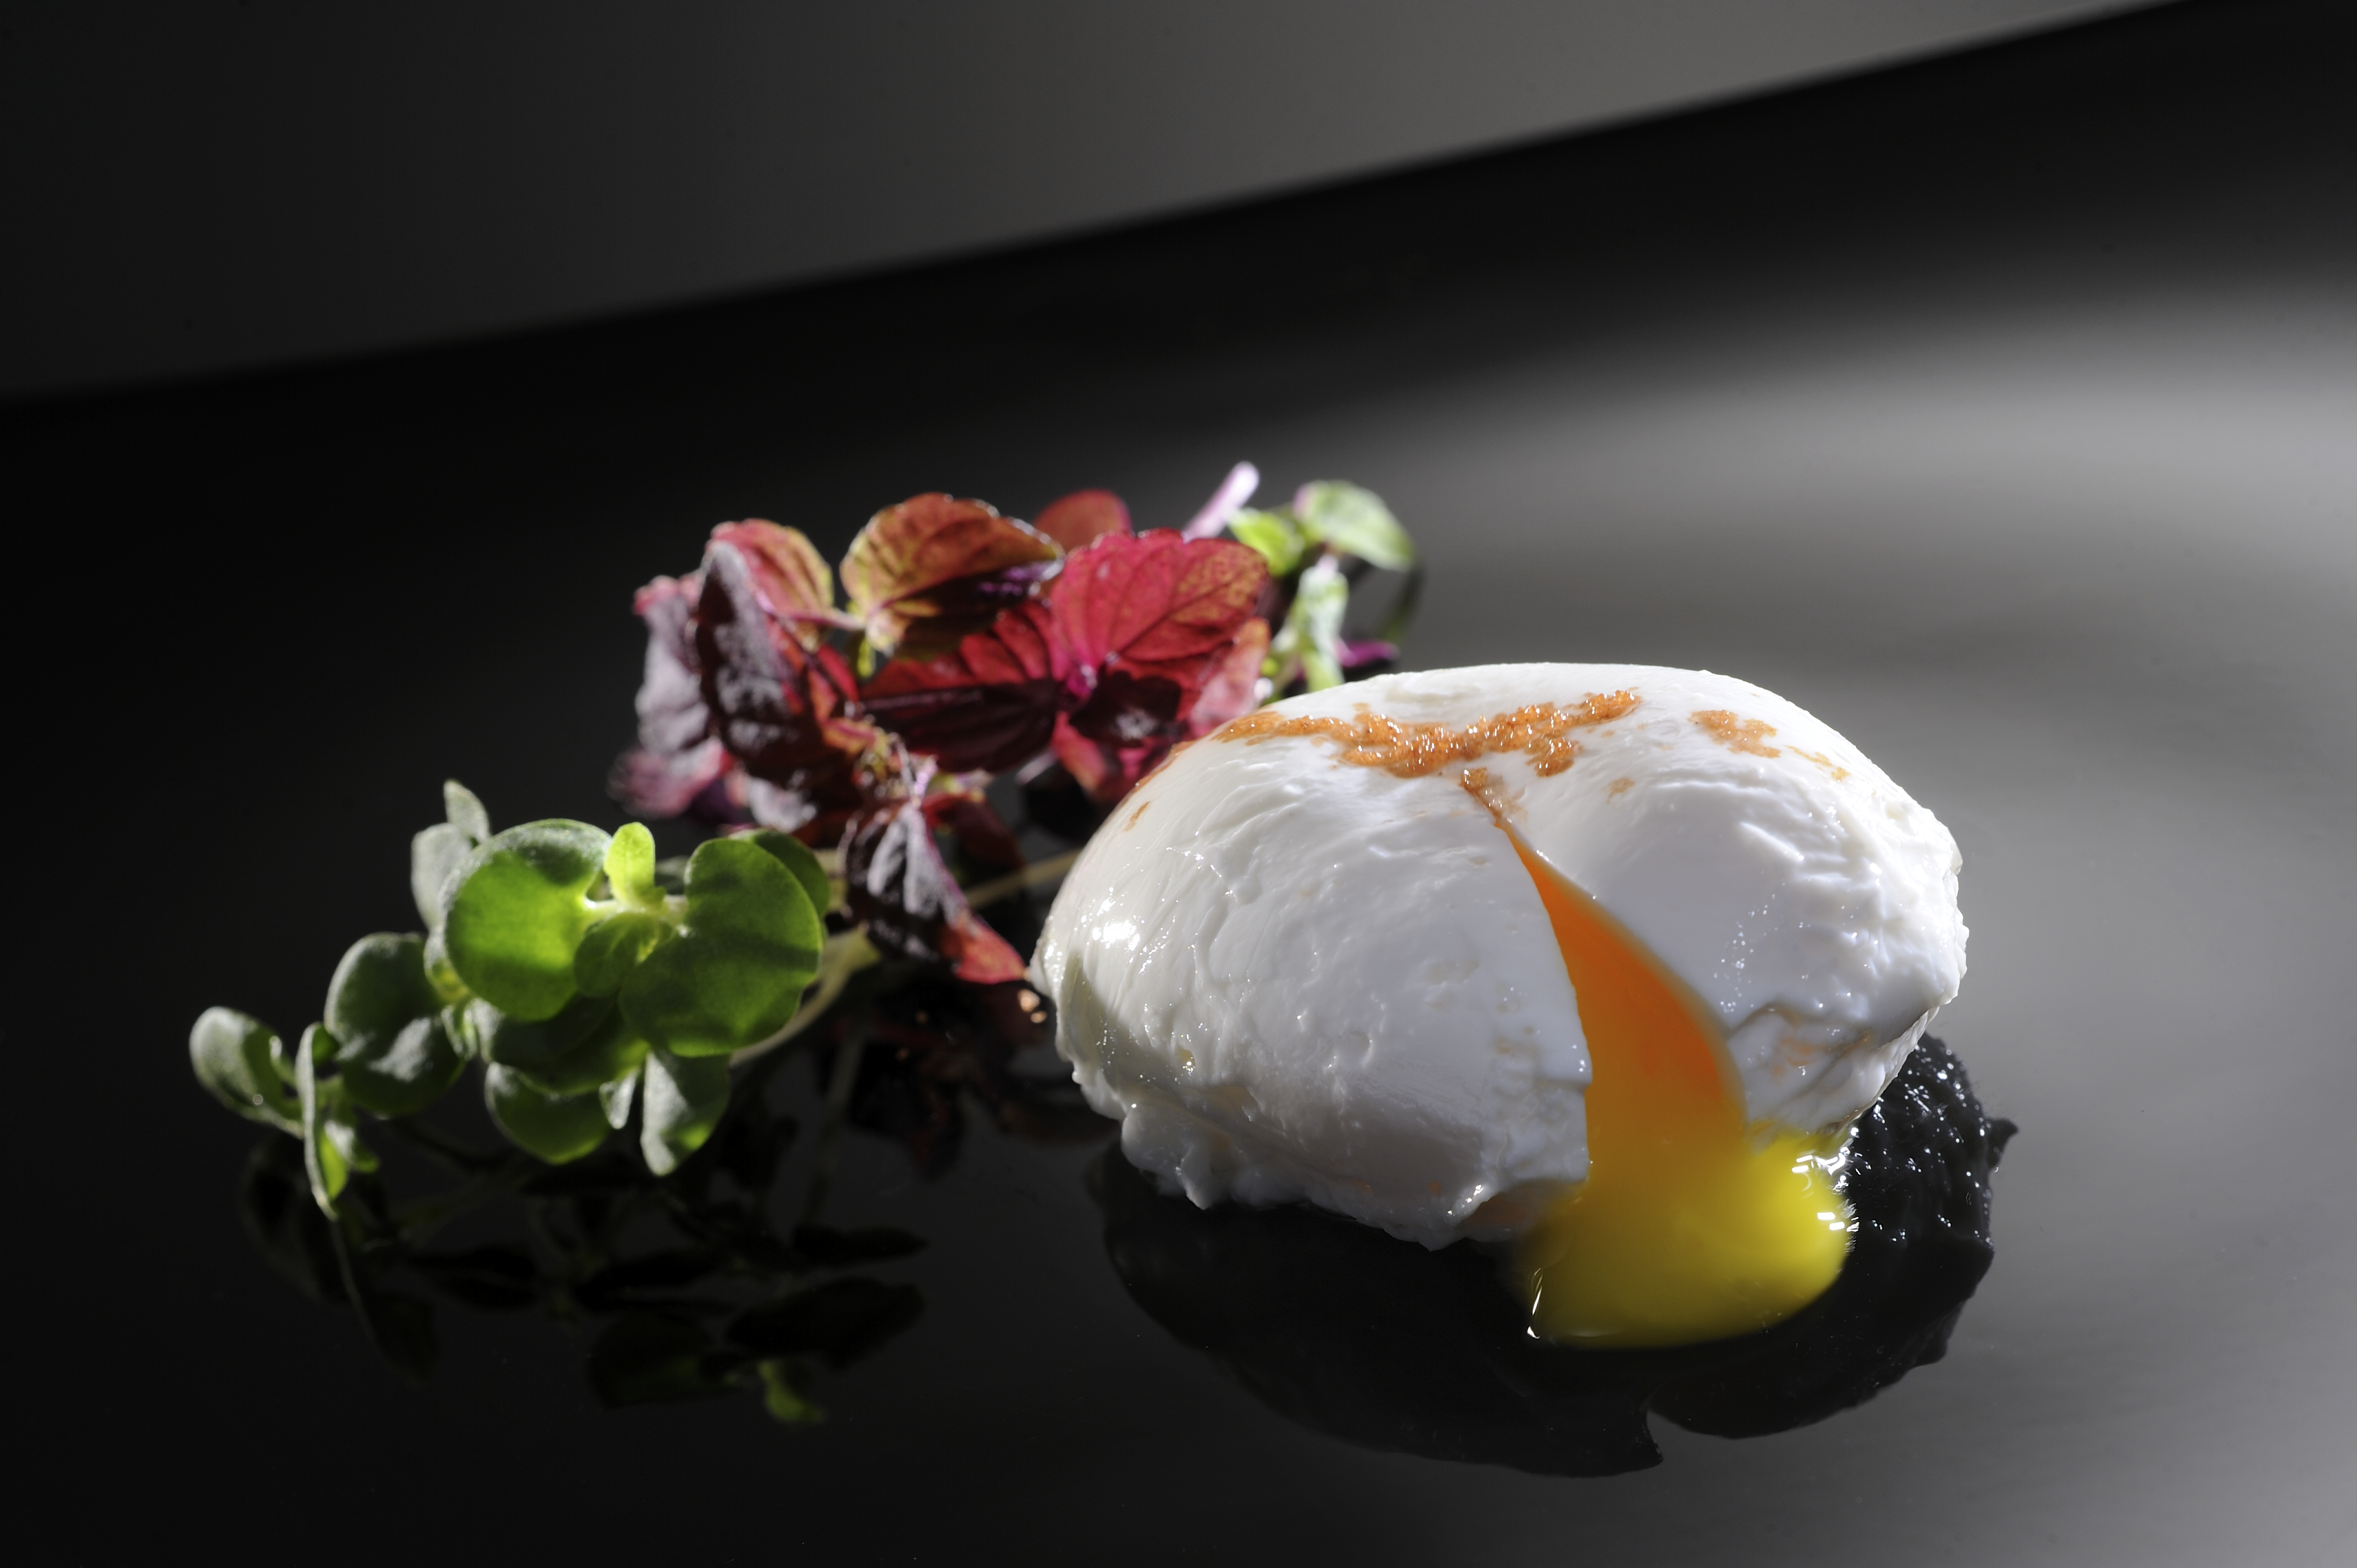 Eric Heurtel - Truffled poached egg